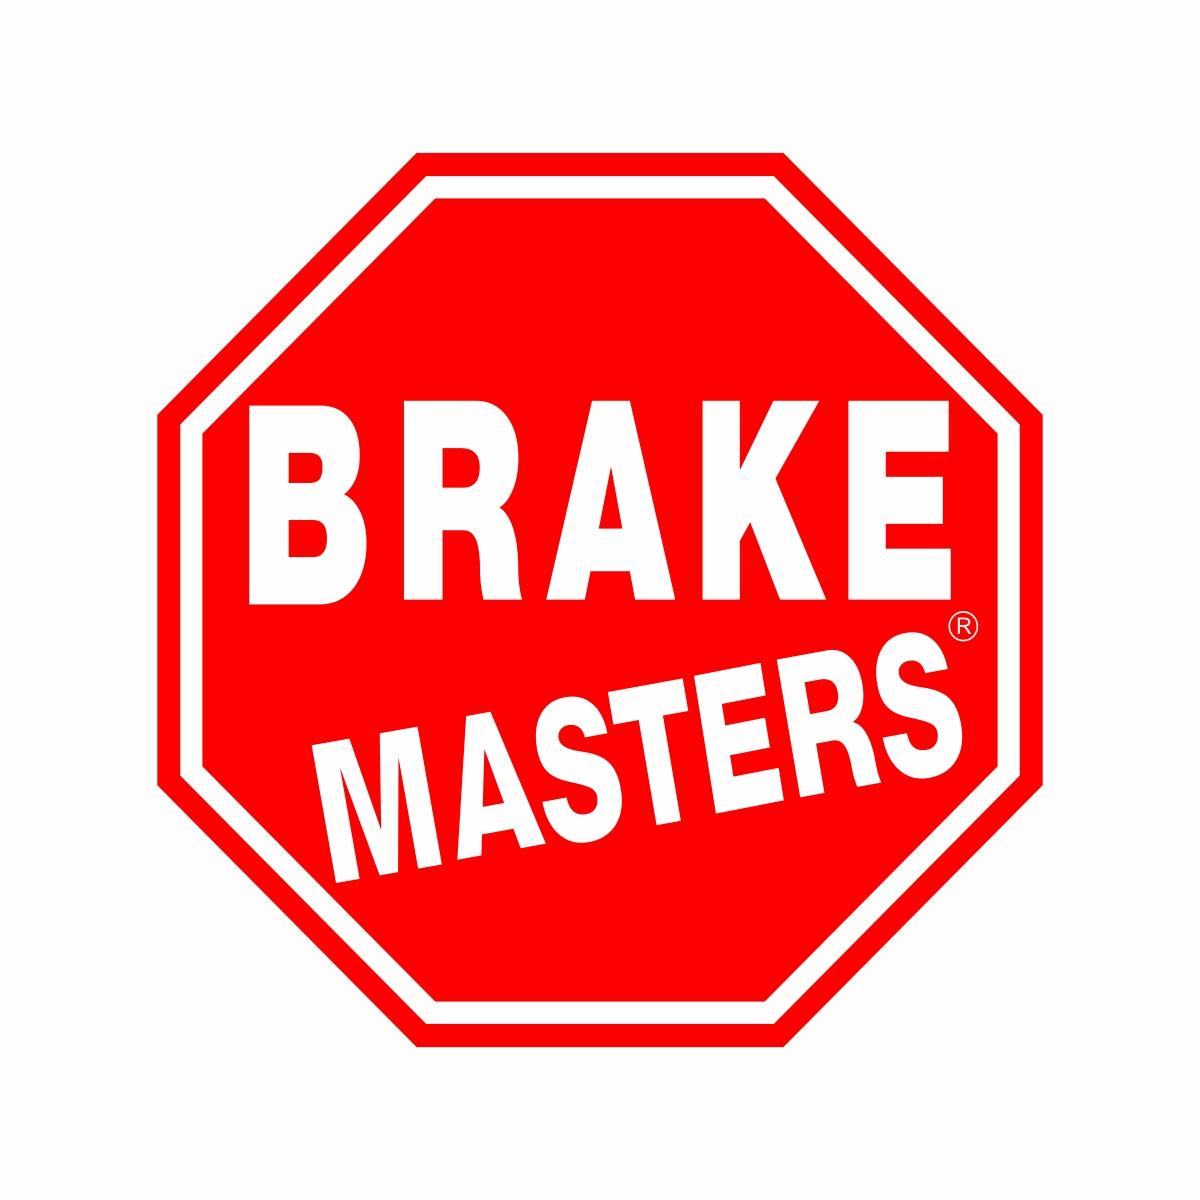 https://promotionplusinc.com/wp-content/uploads/2019/04/Brake-Masters.jpg